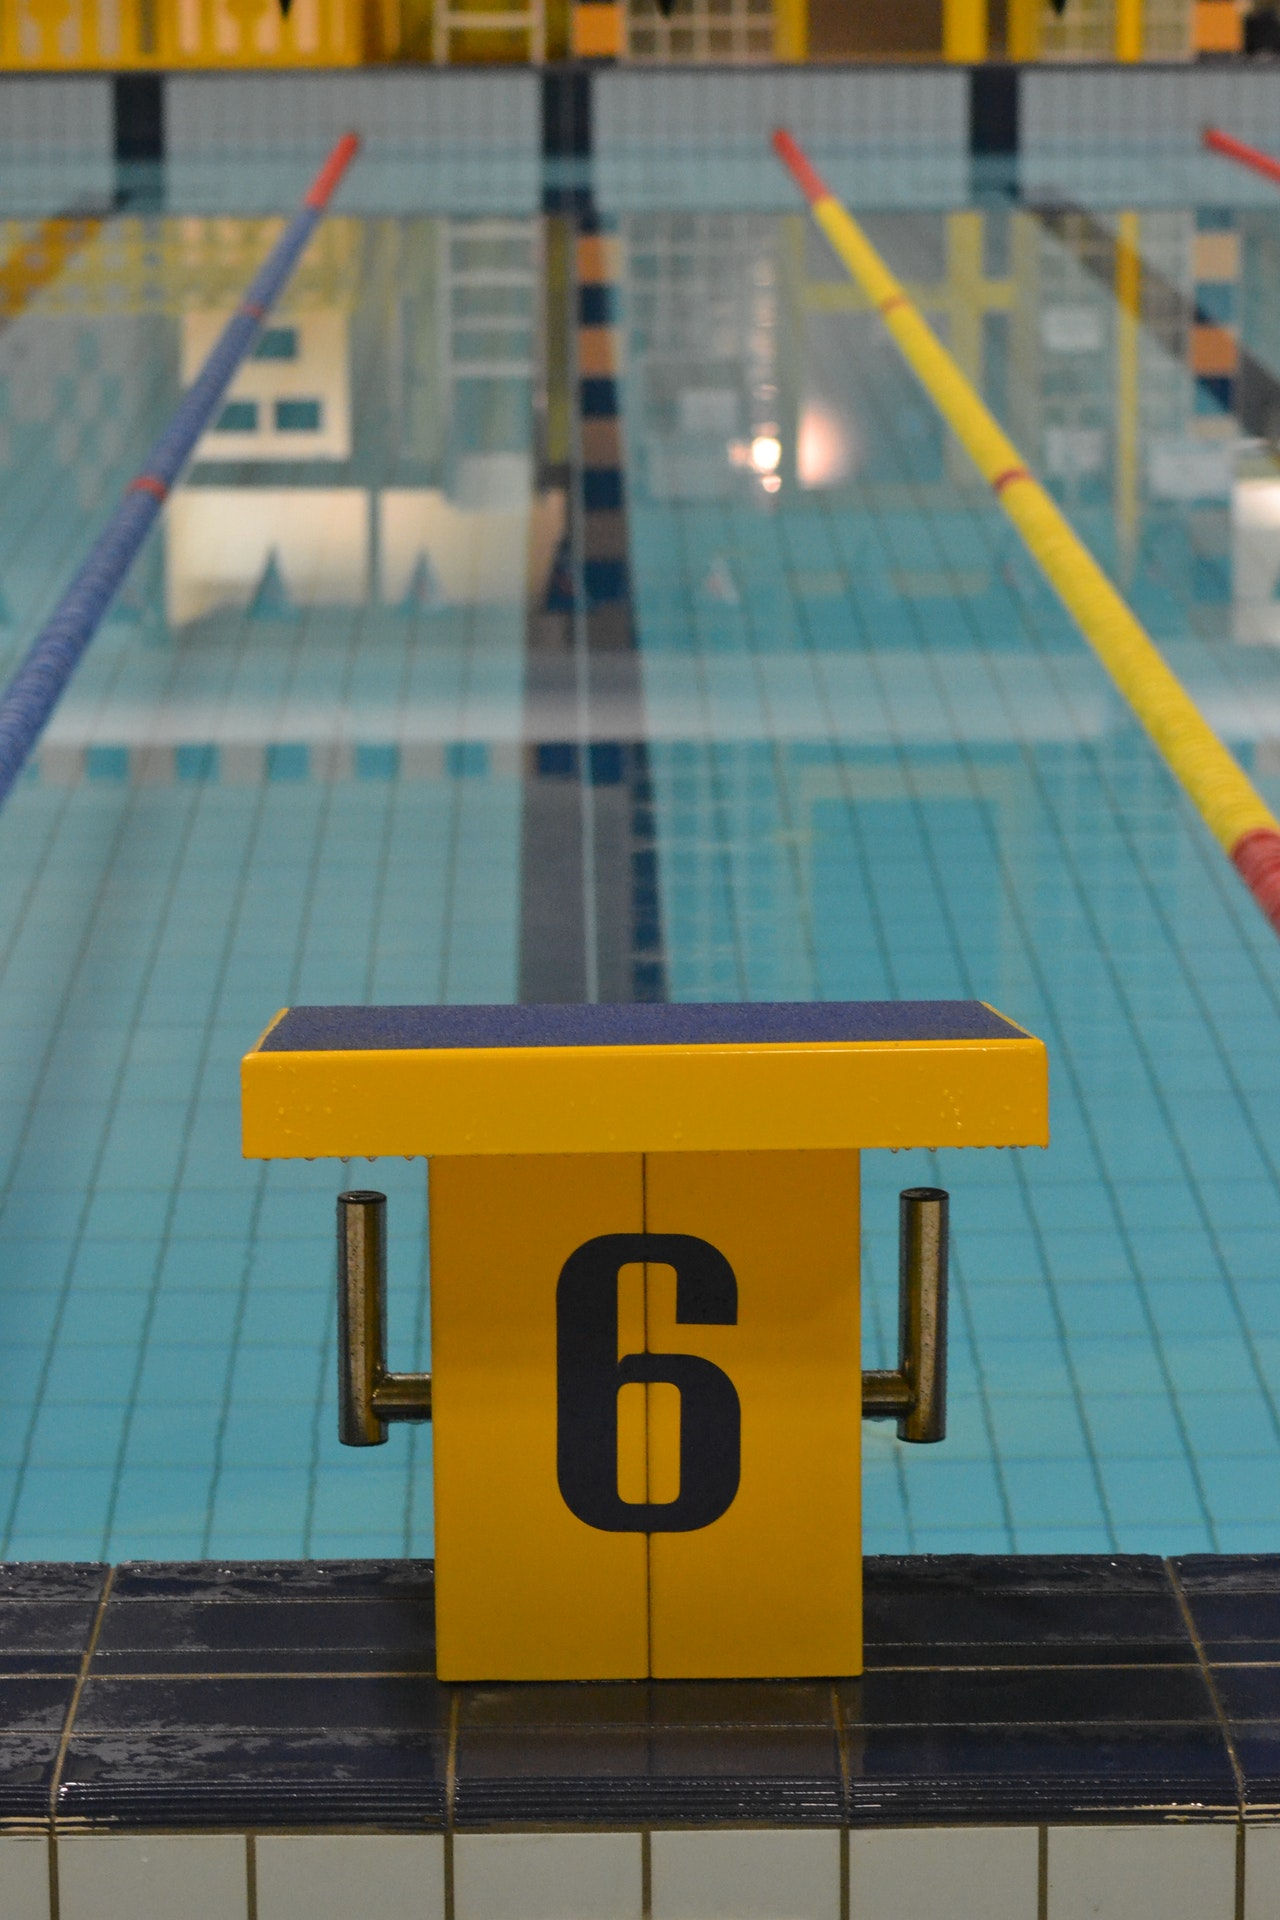 Types of training: Swimming